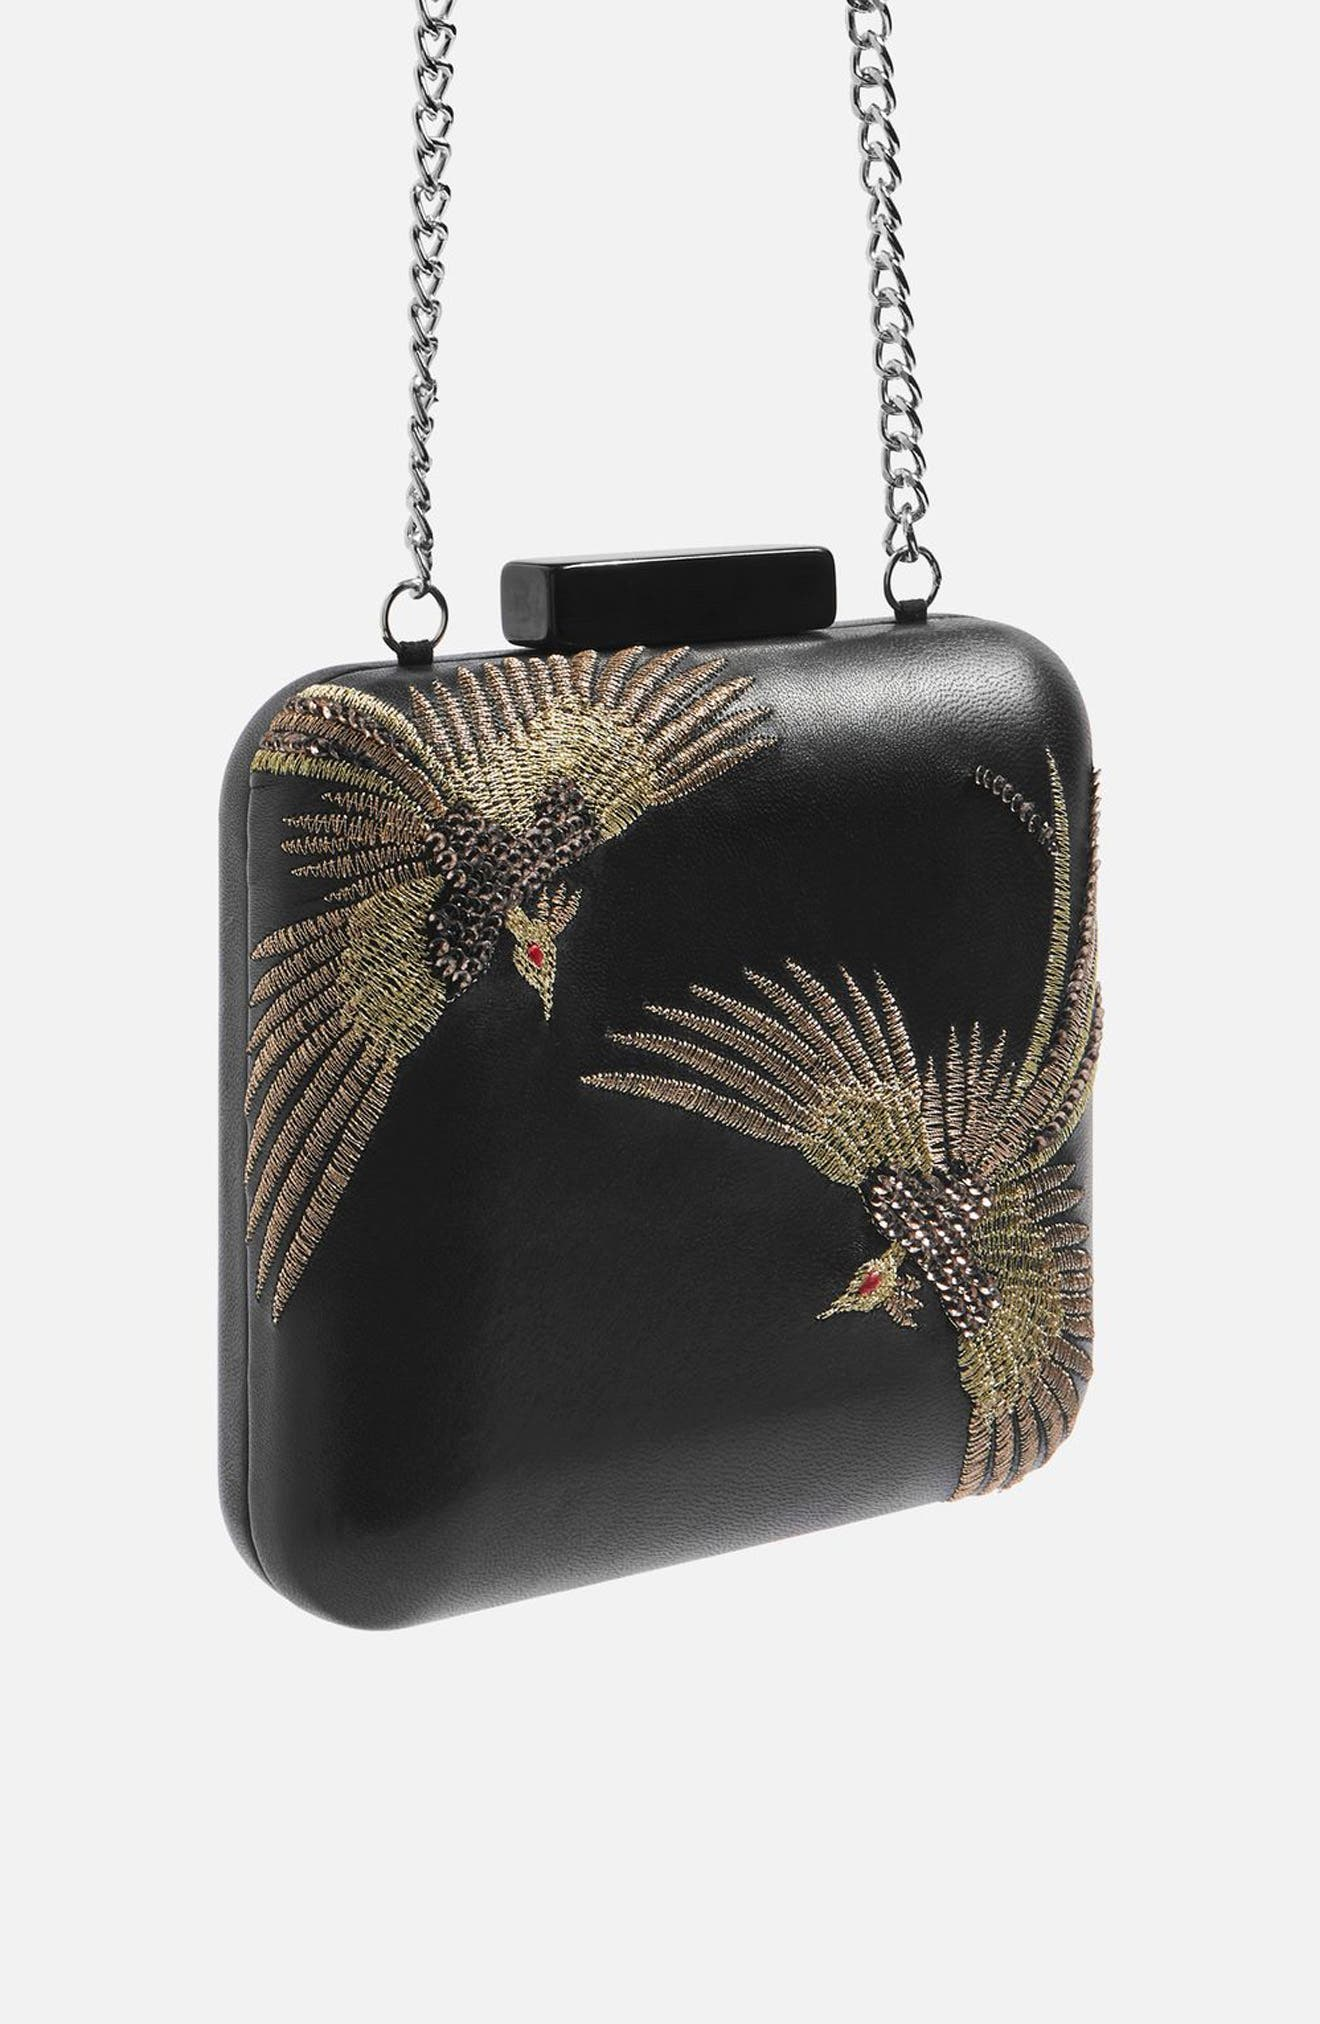 Embroidered Bird Boxy Leather Crossbody Bag,                             Alternate thumbnail 3, color,                             Black Multi